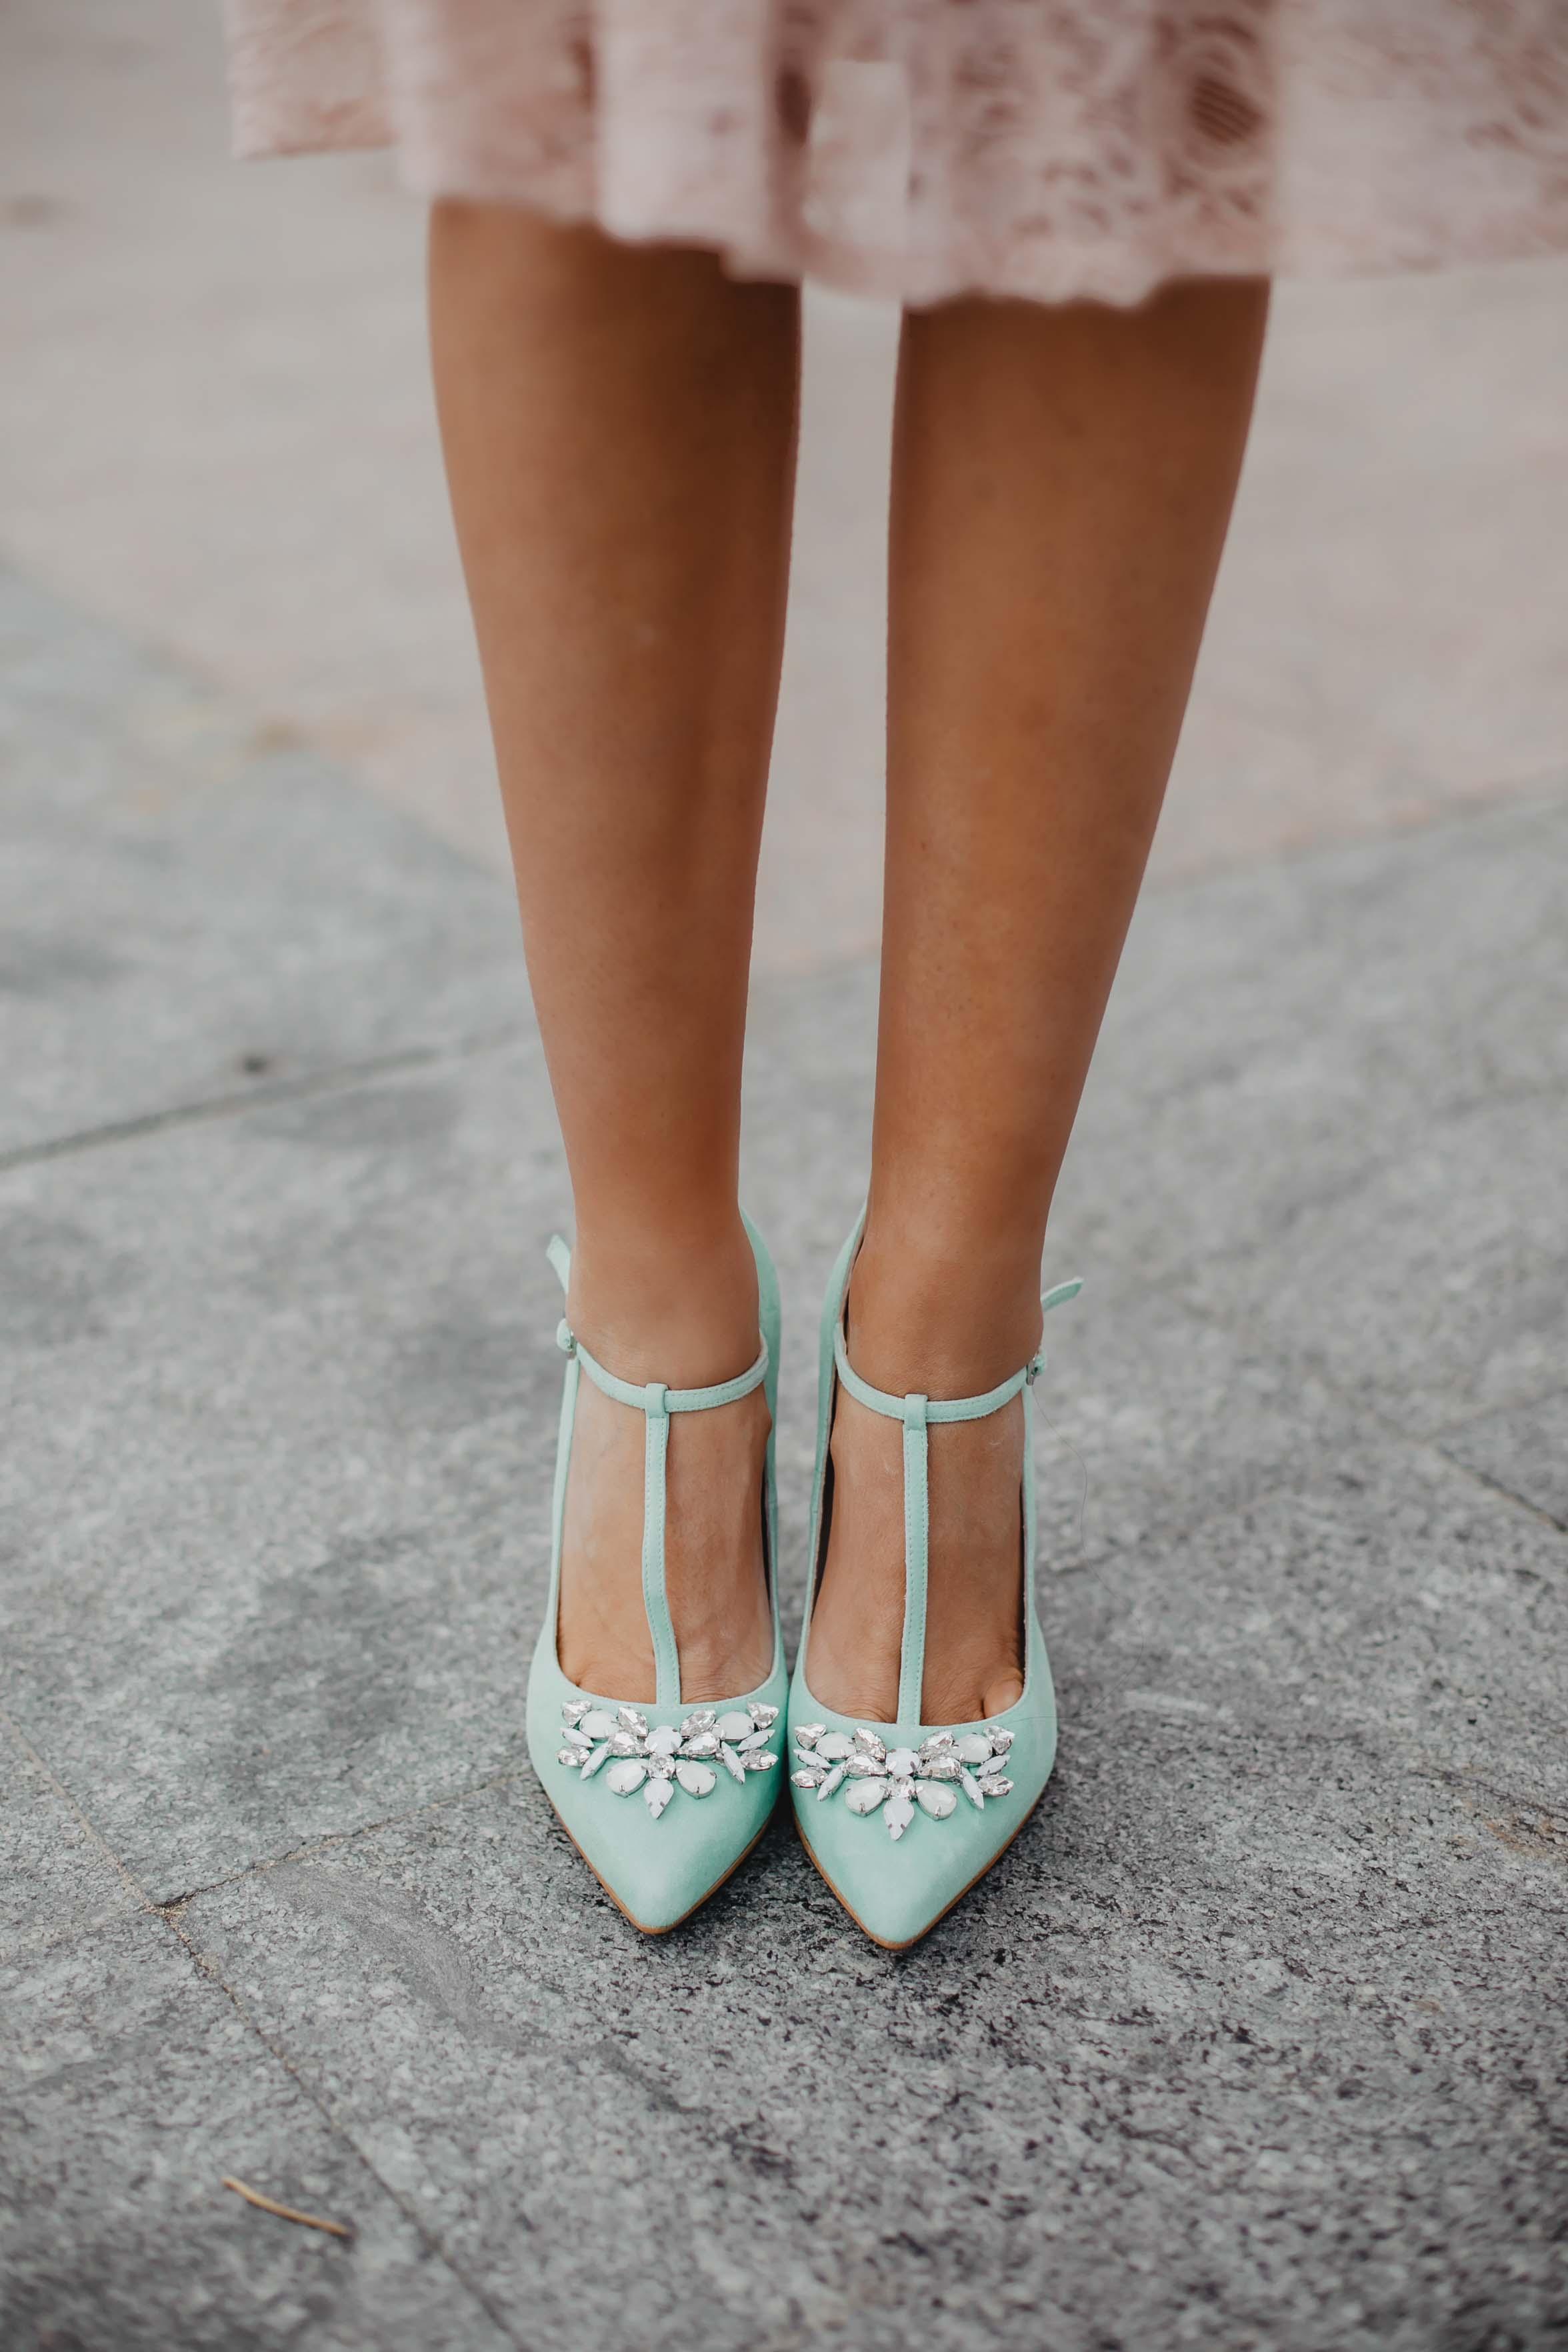 Zapatos verde agua mint invitada novias